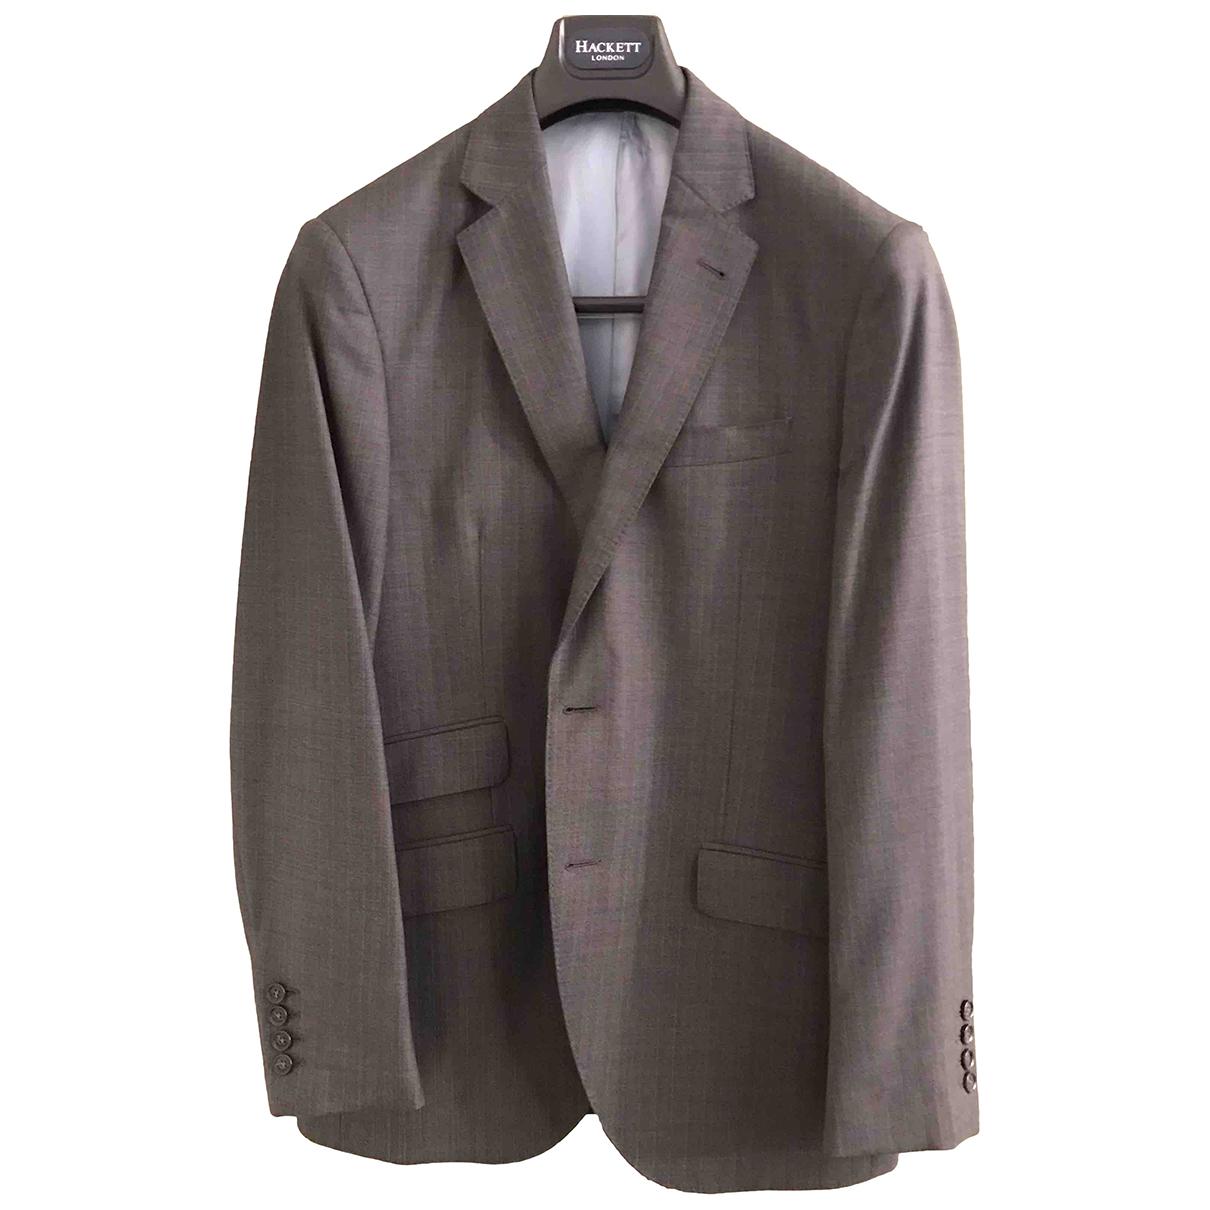 Hackett London N Grey Wool Suits for Men L International